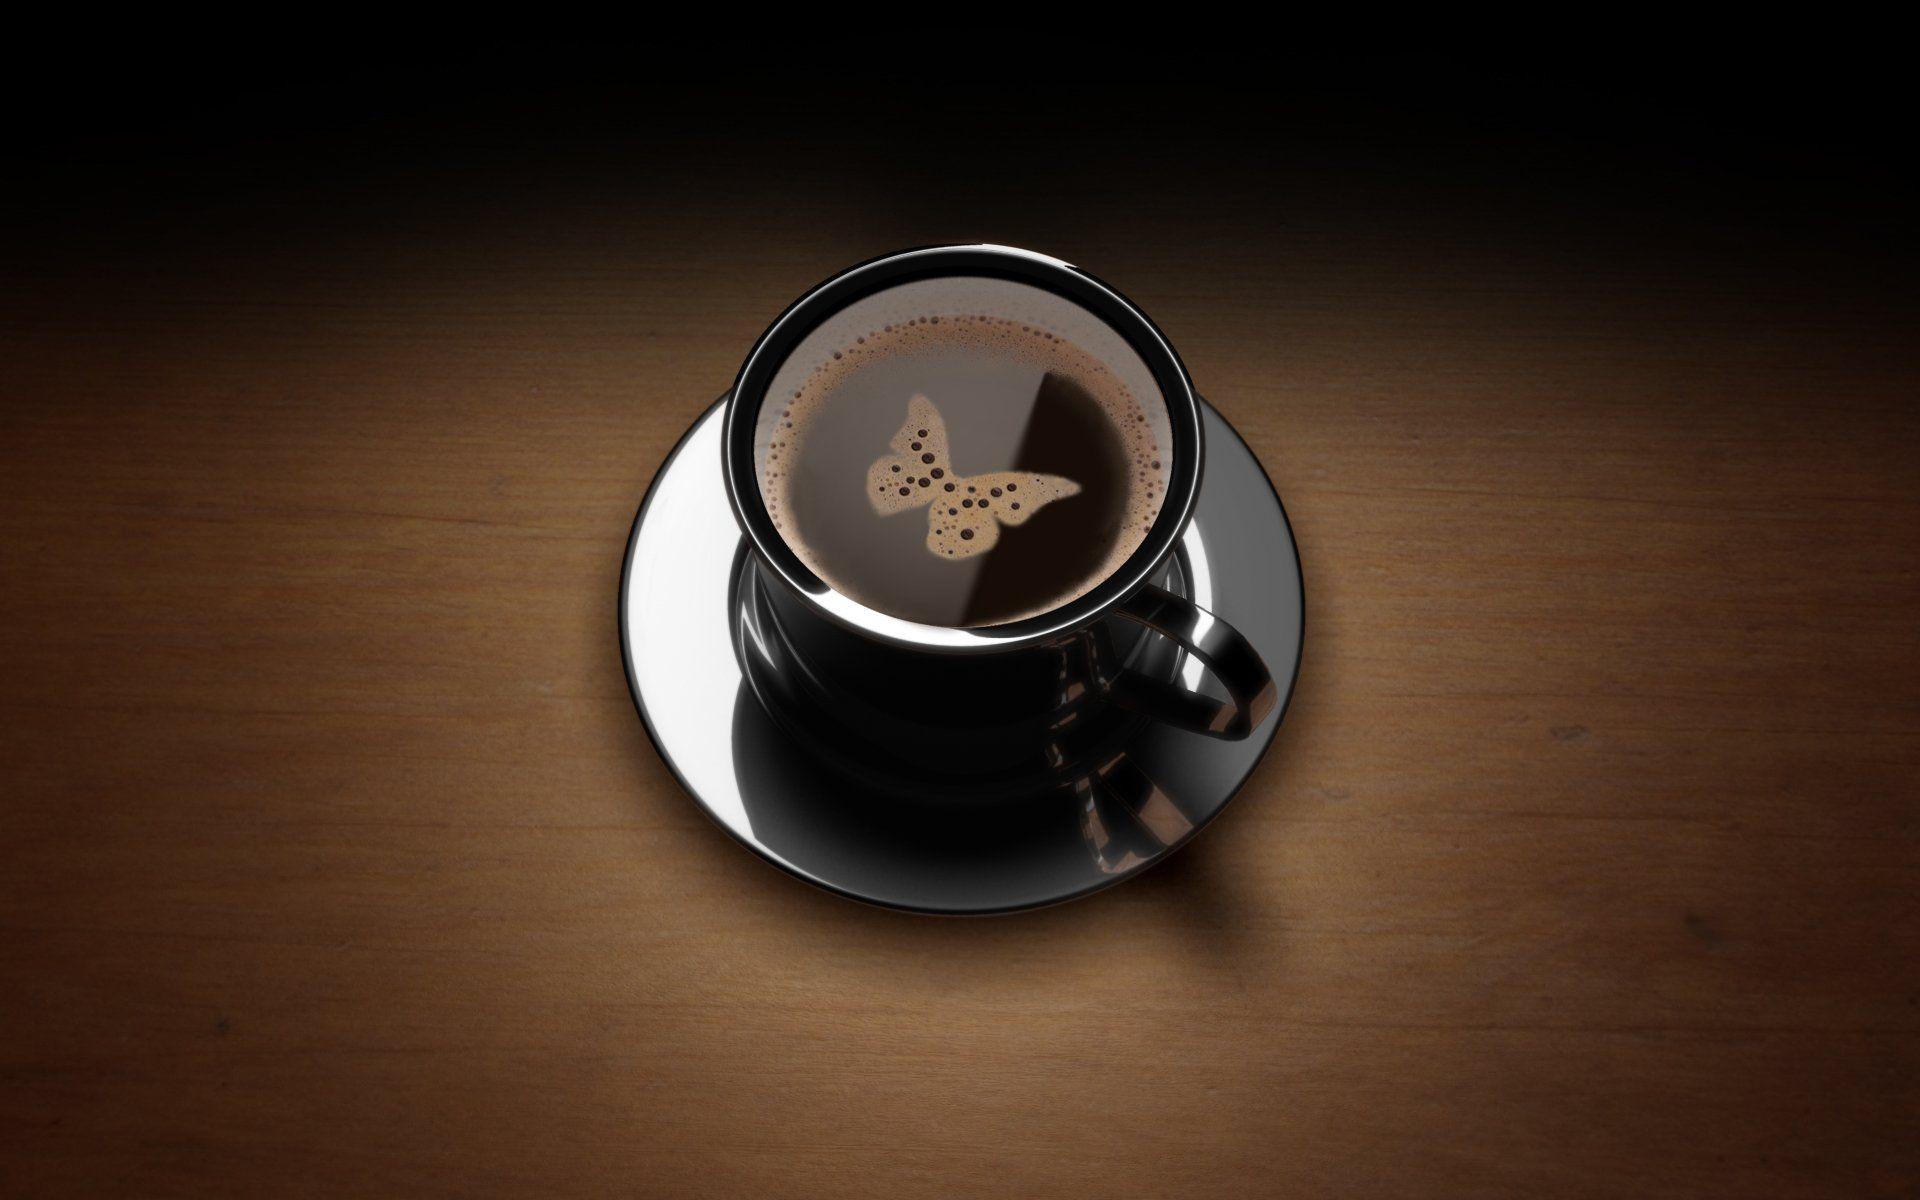 coffee screensaver hd